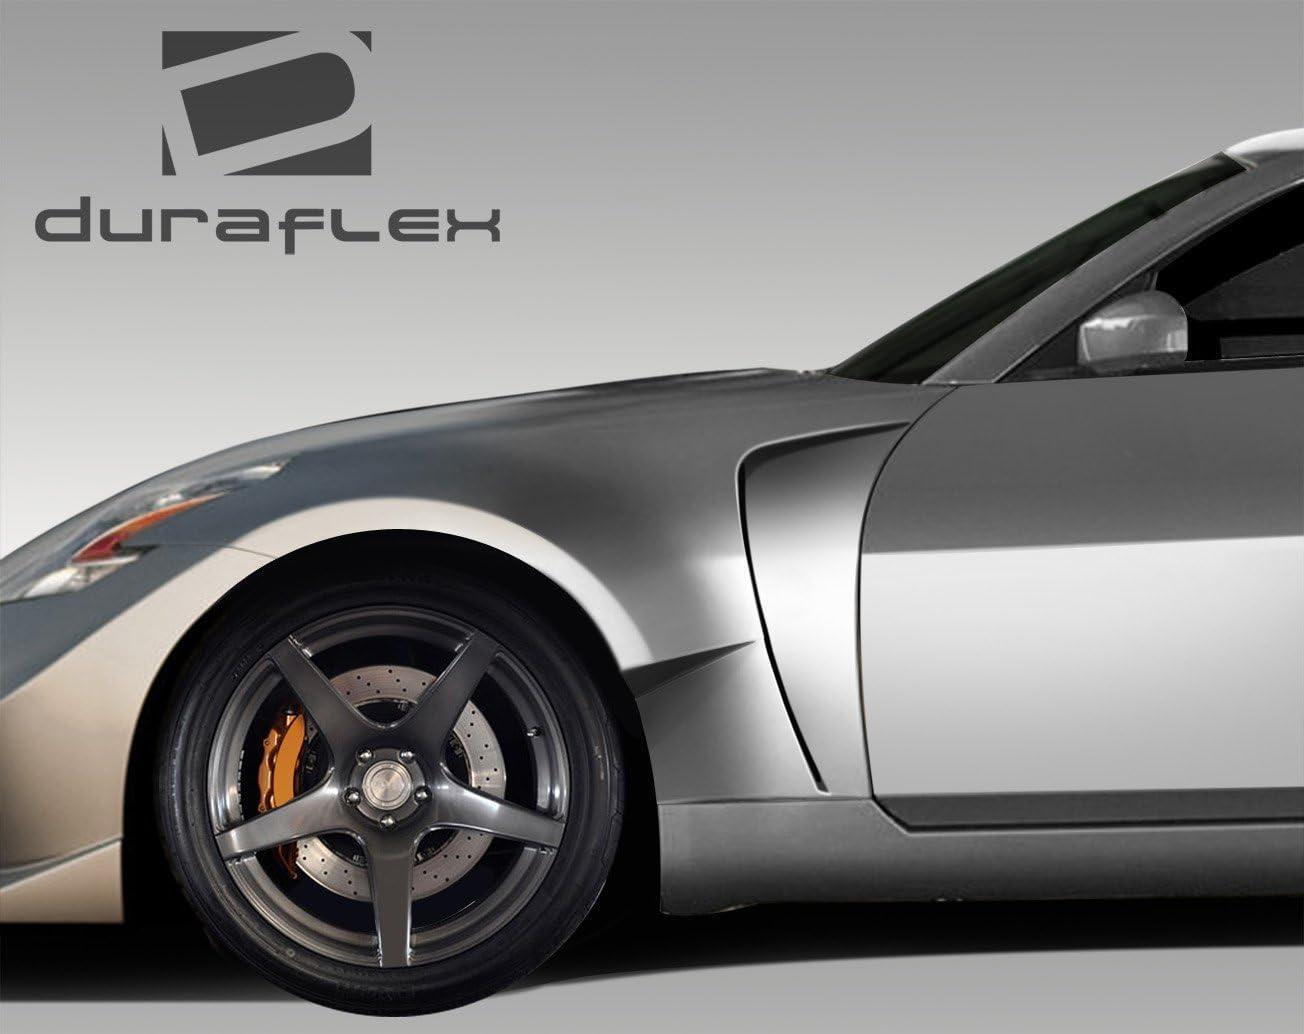 Compatible For Nissan 350Z 2003-2008 Duraflex ED-BQD-316 RBS Front Fender Flares 2 Piece Body Kit